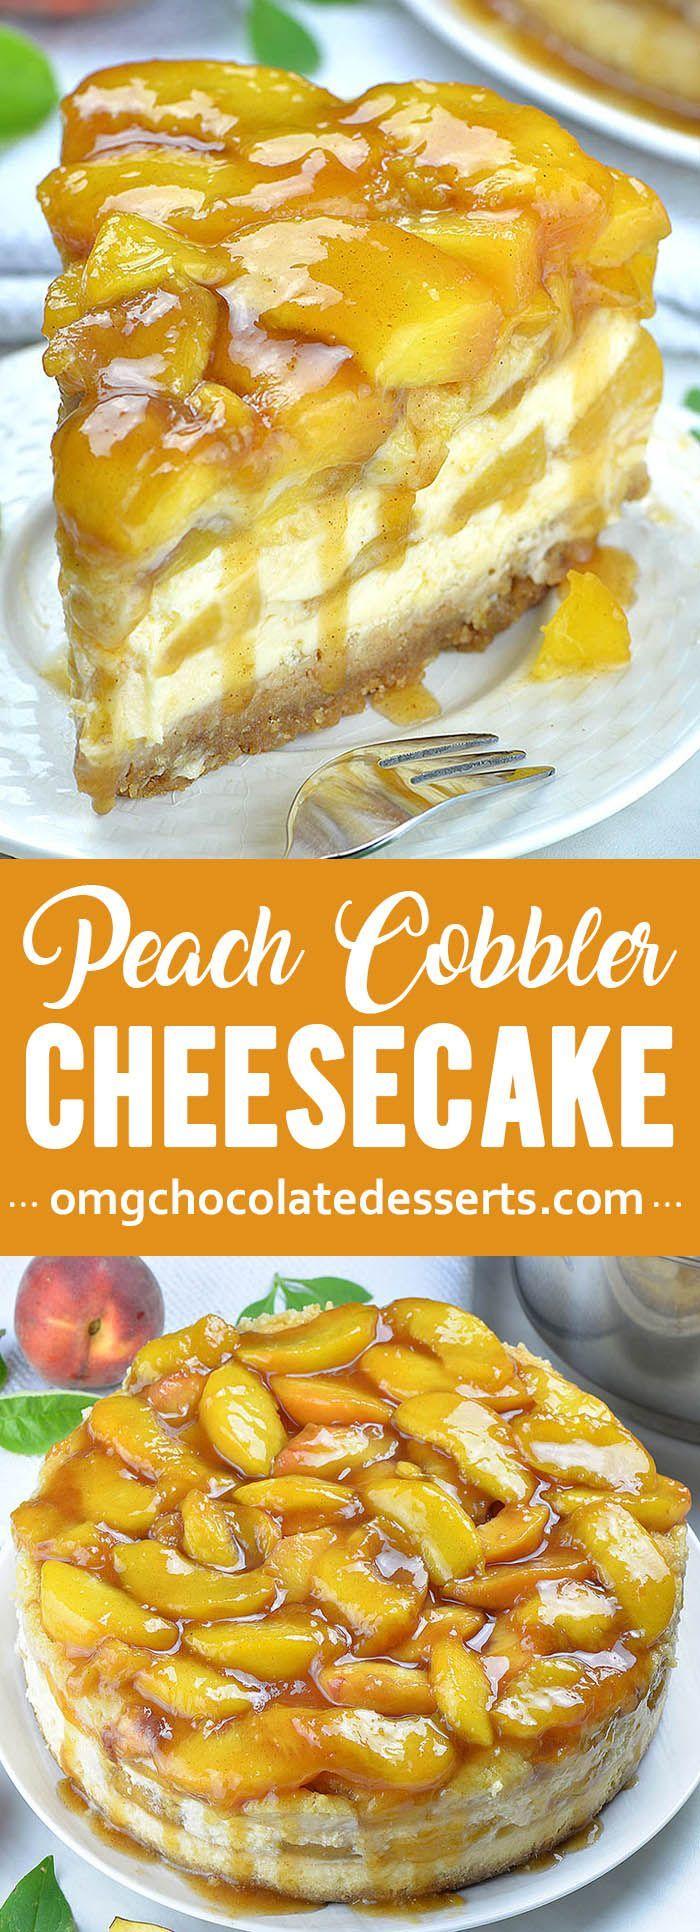 Photo of Peach Cobbler Cheesecake